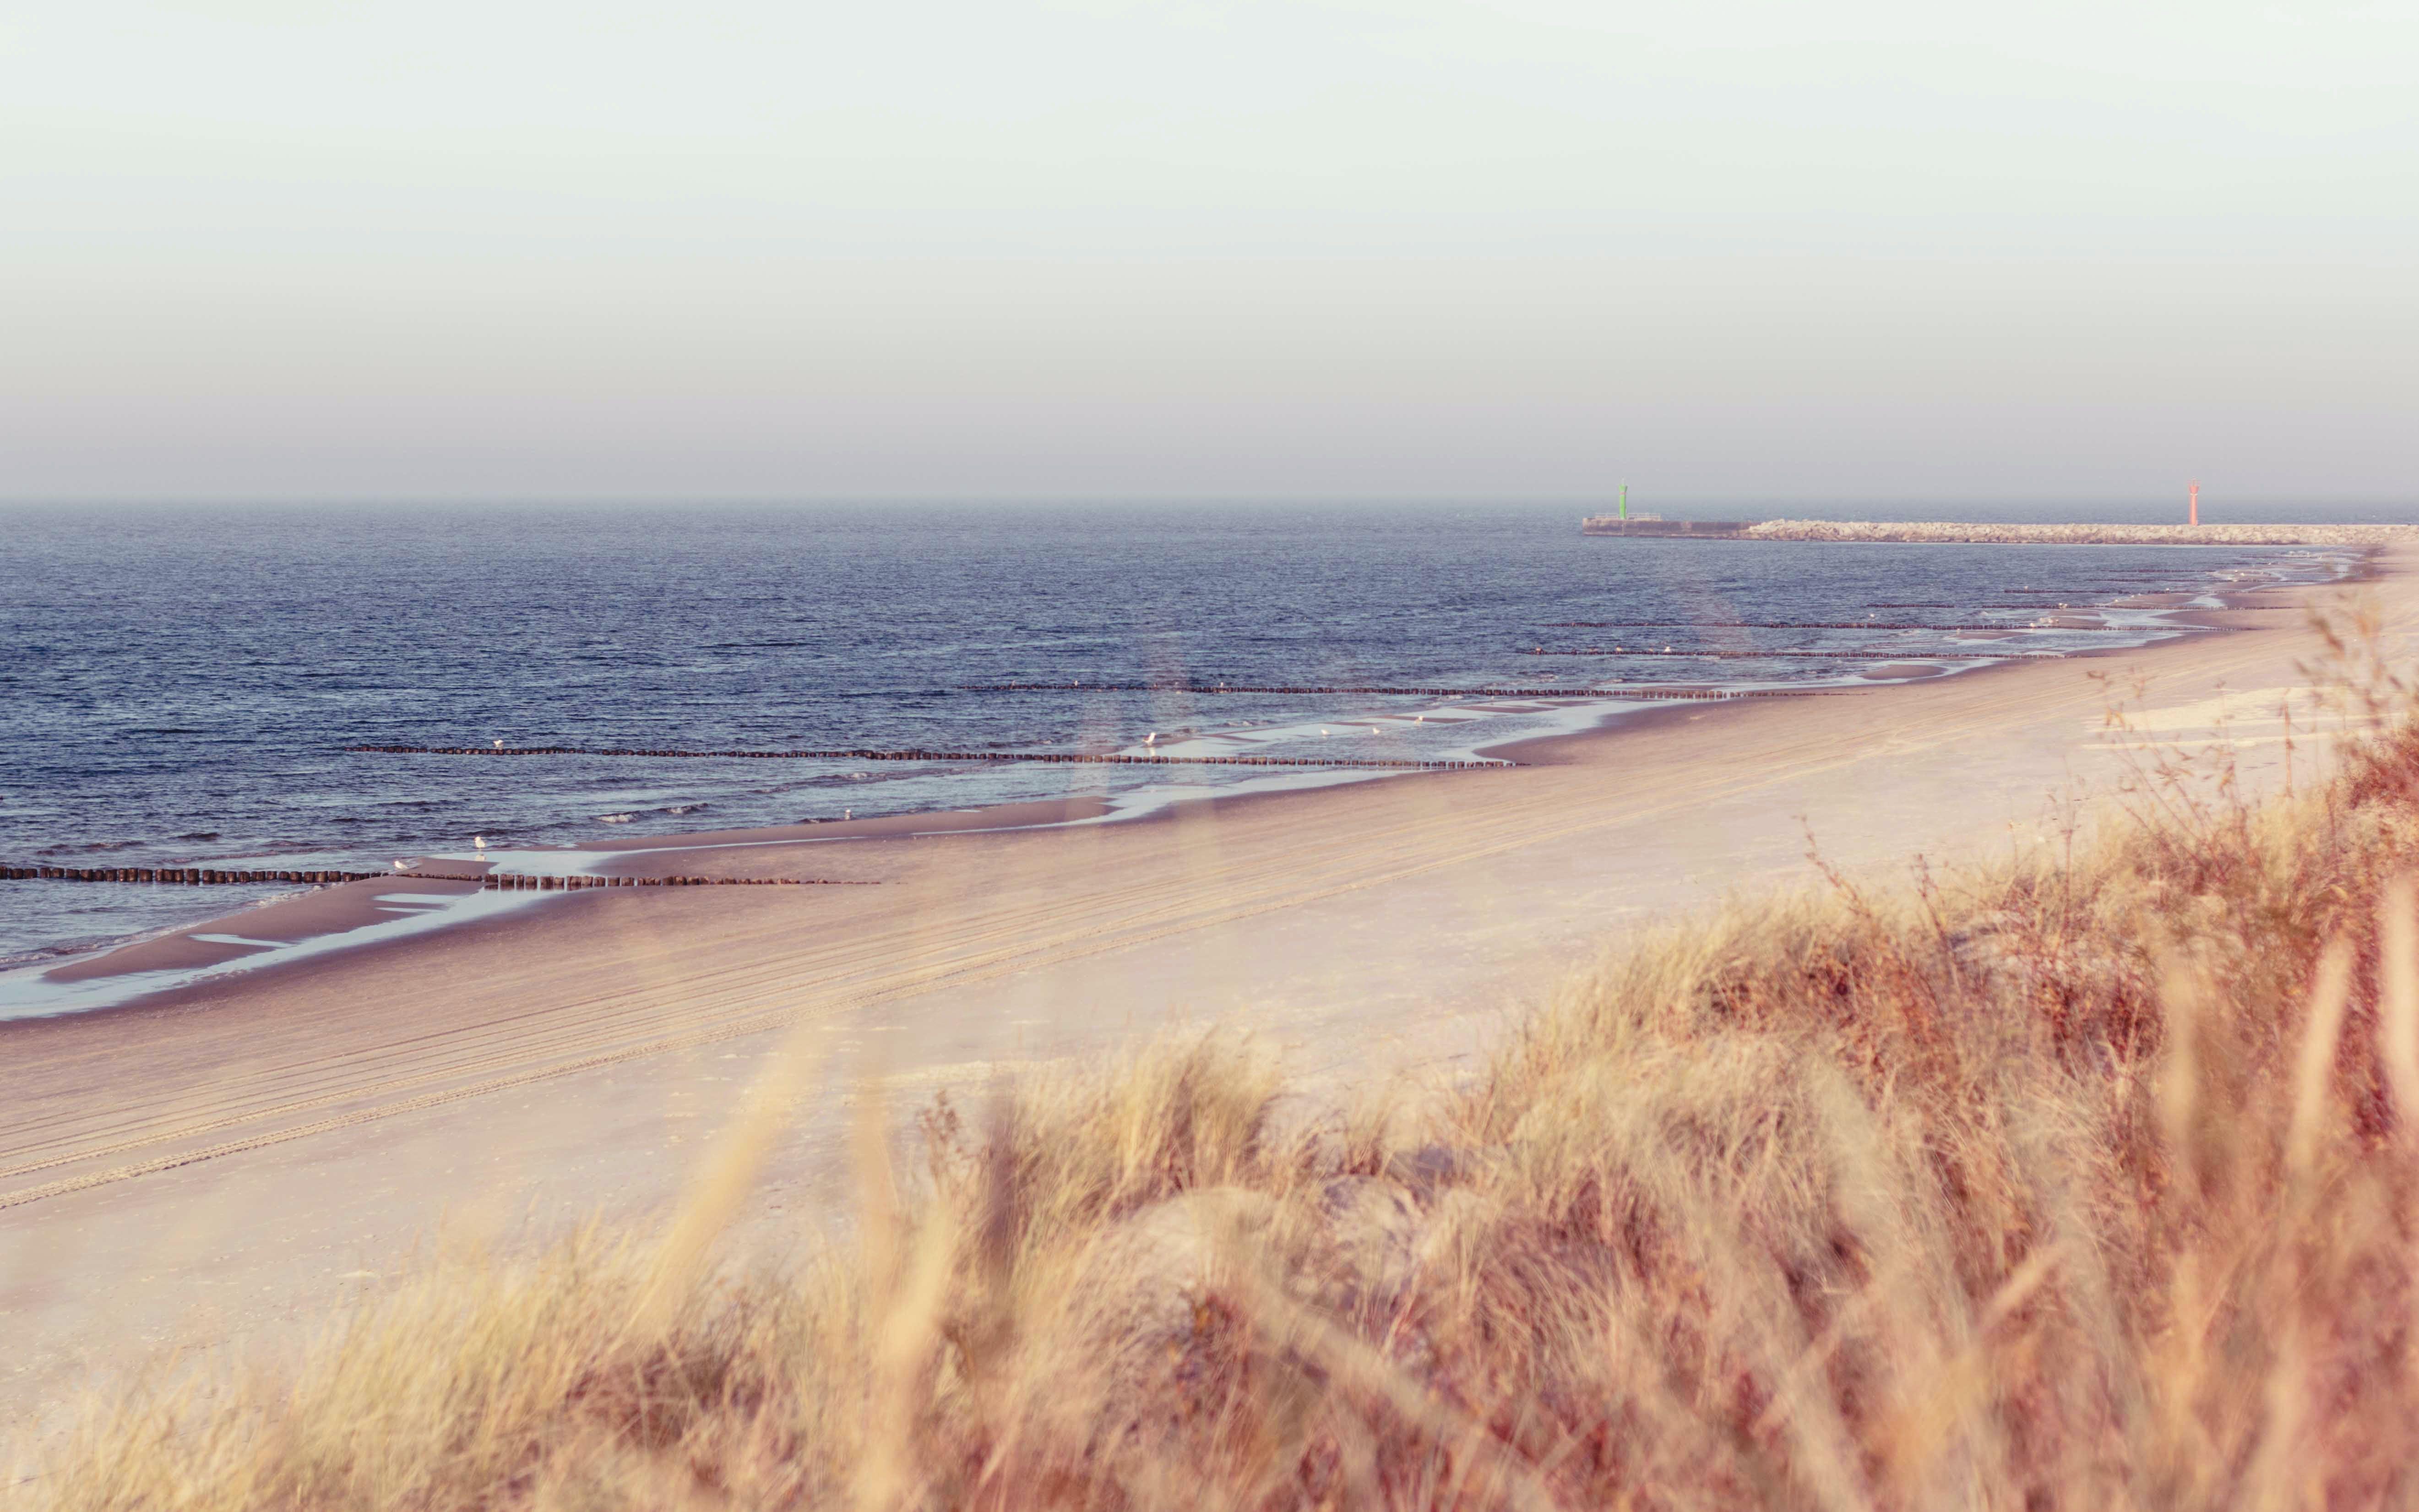 Scenic View Of Seashore